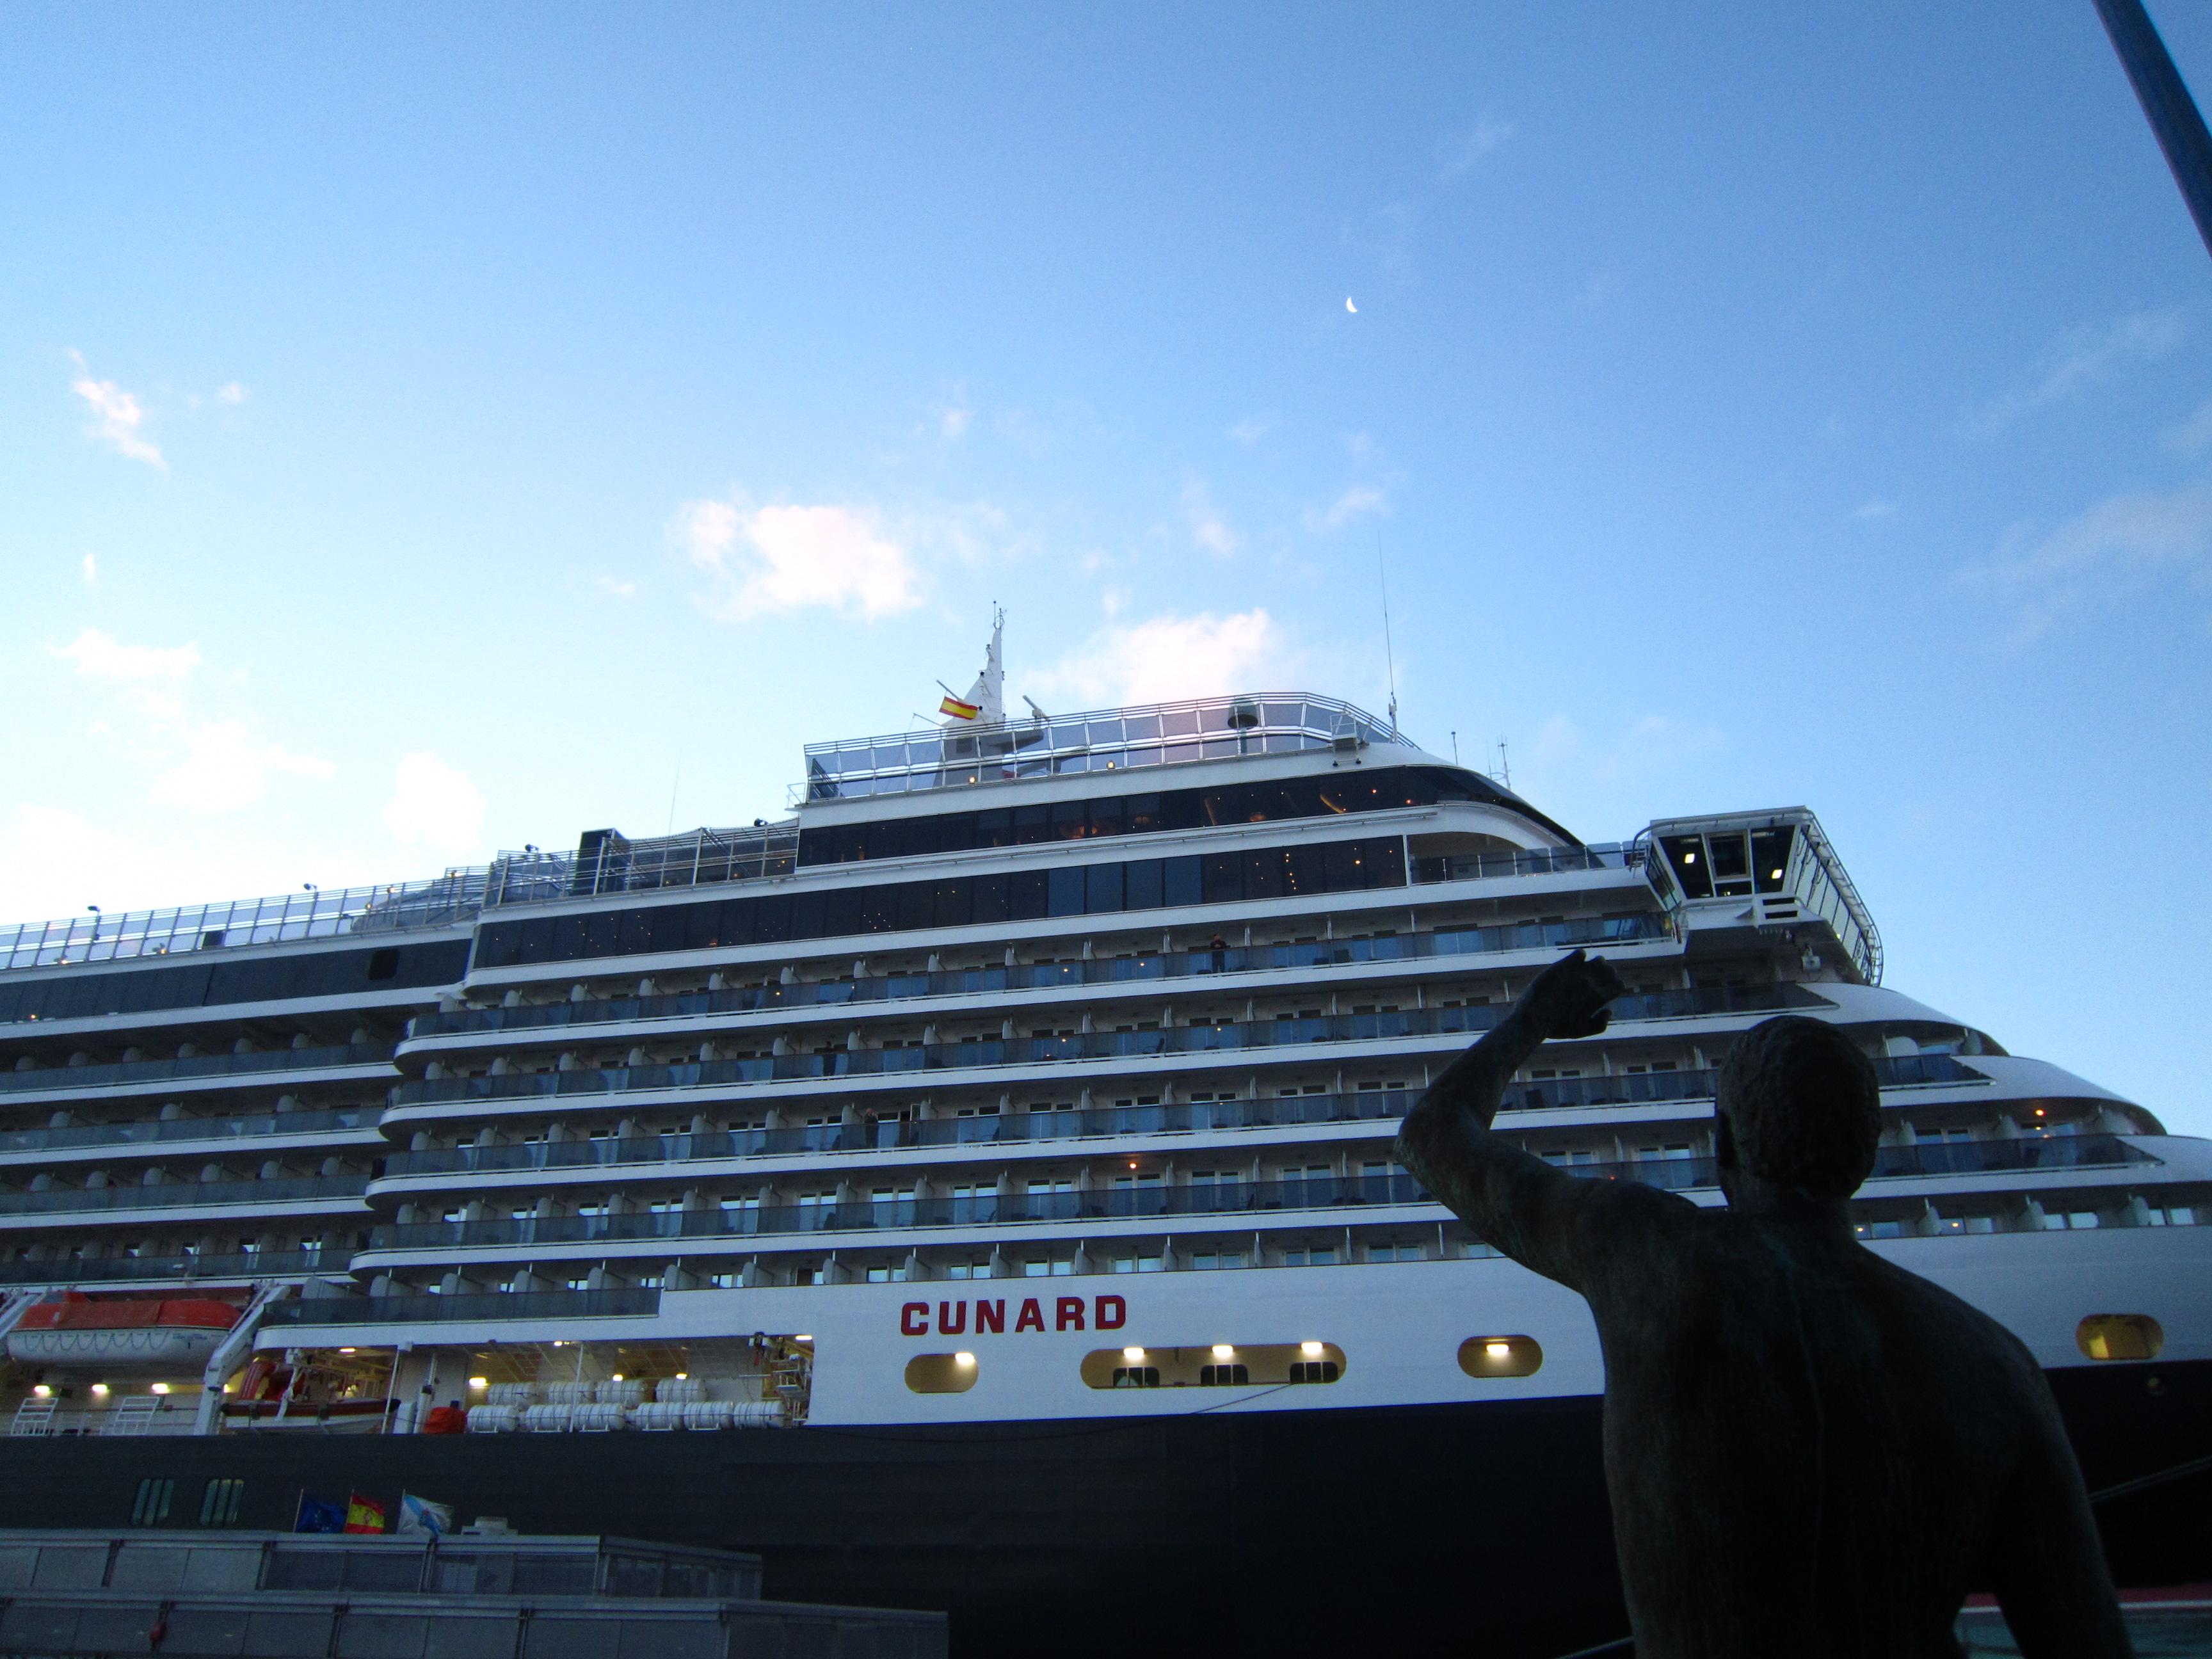 Queen Victoria Cruise